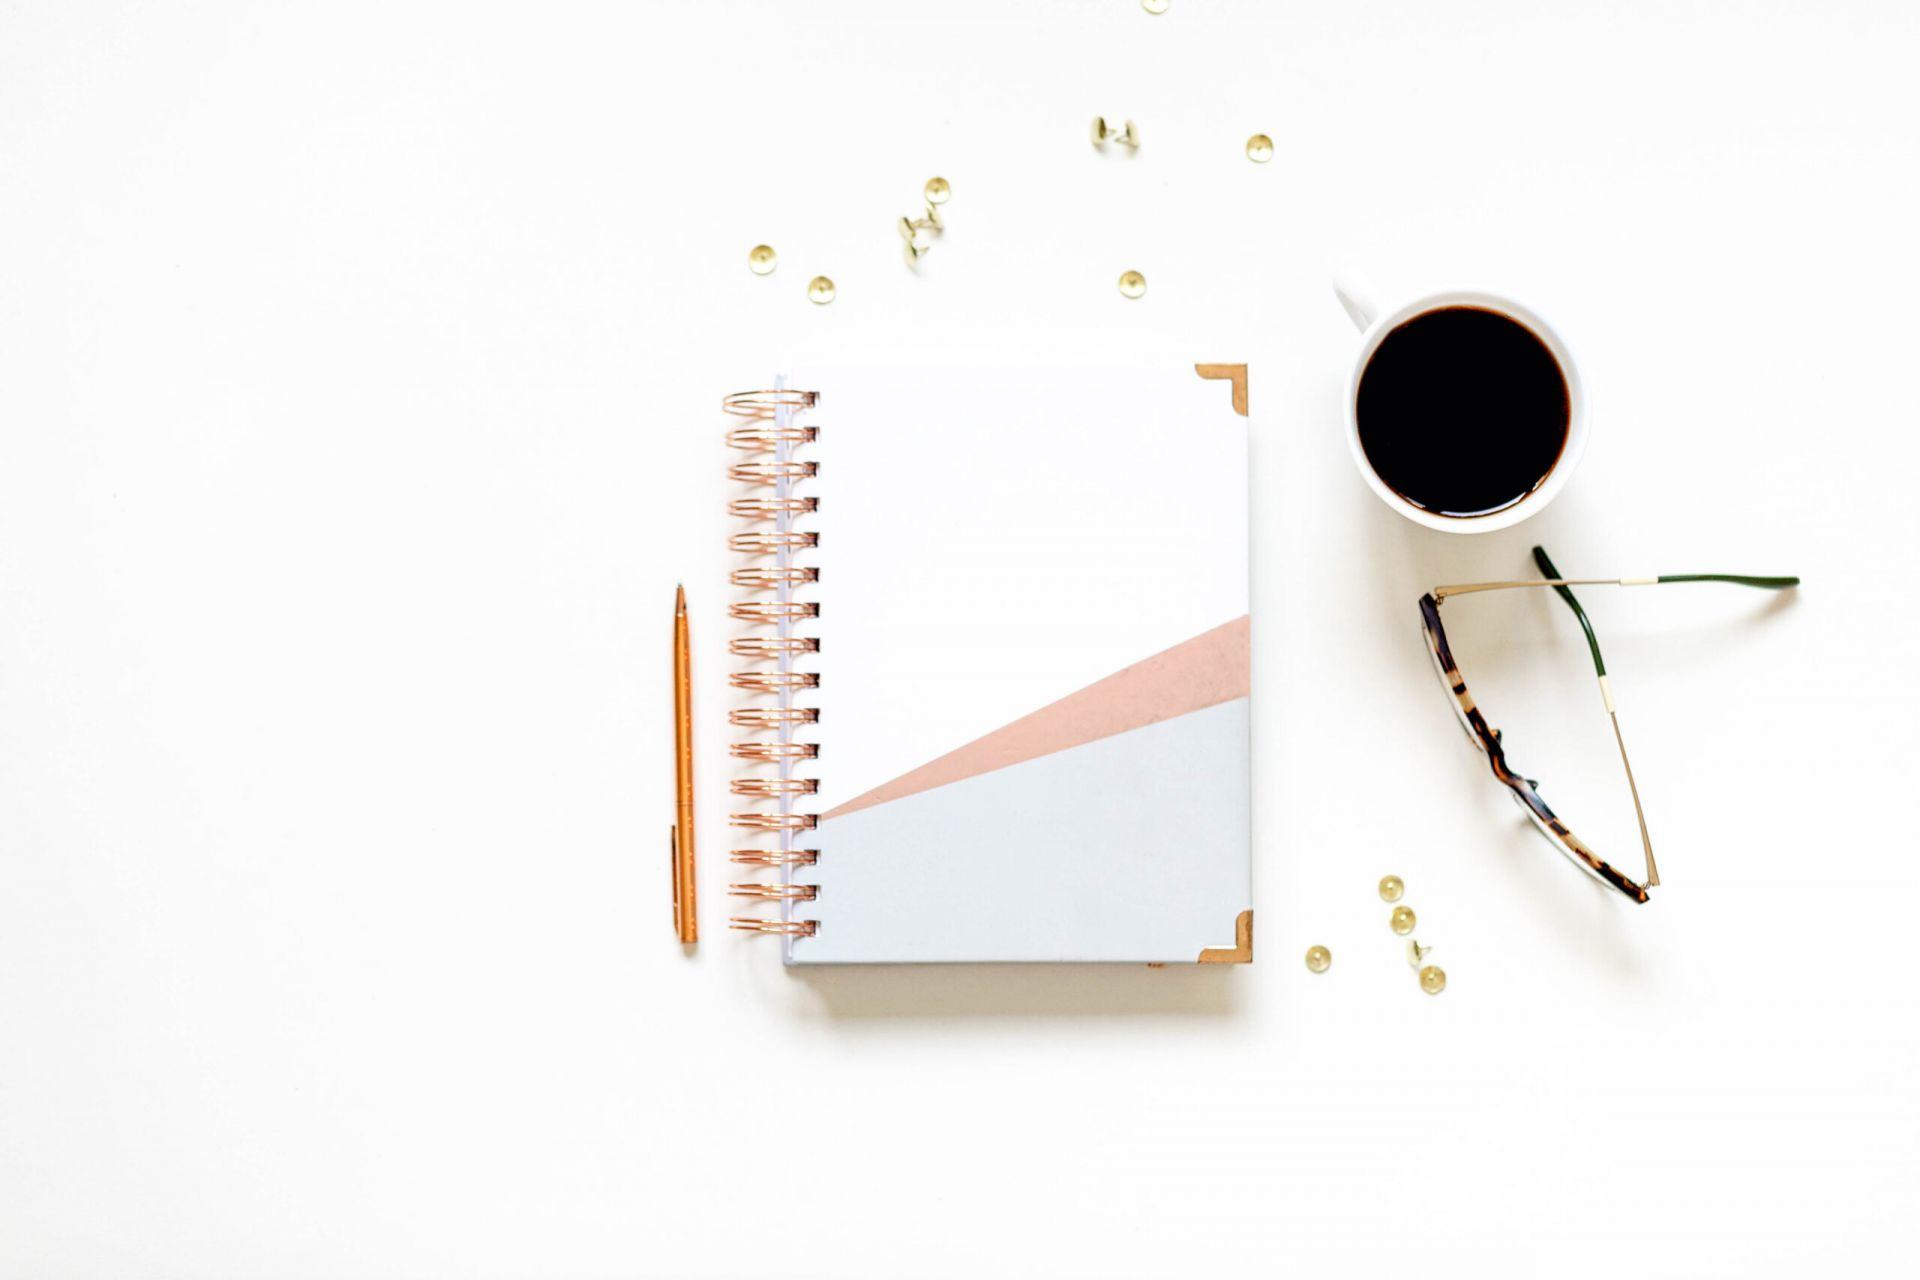 Brainstorming Blog Posts